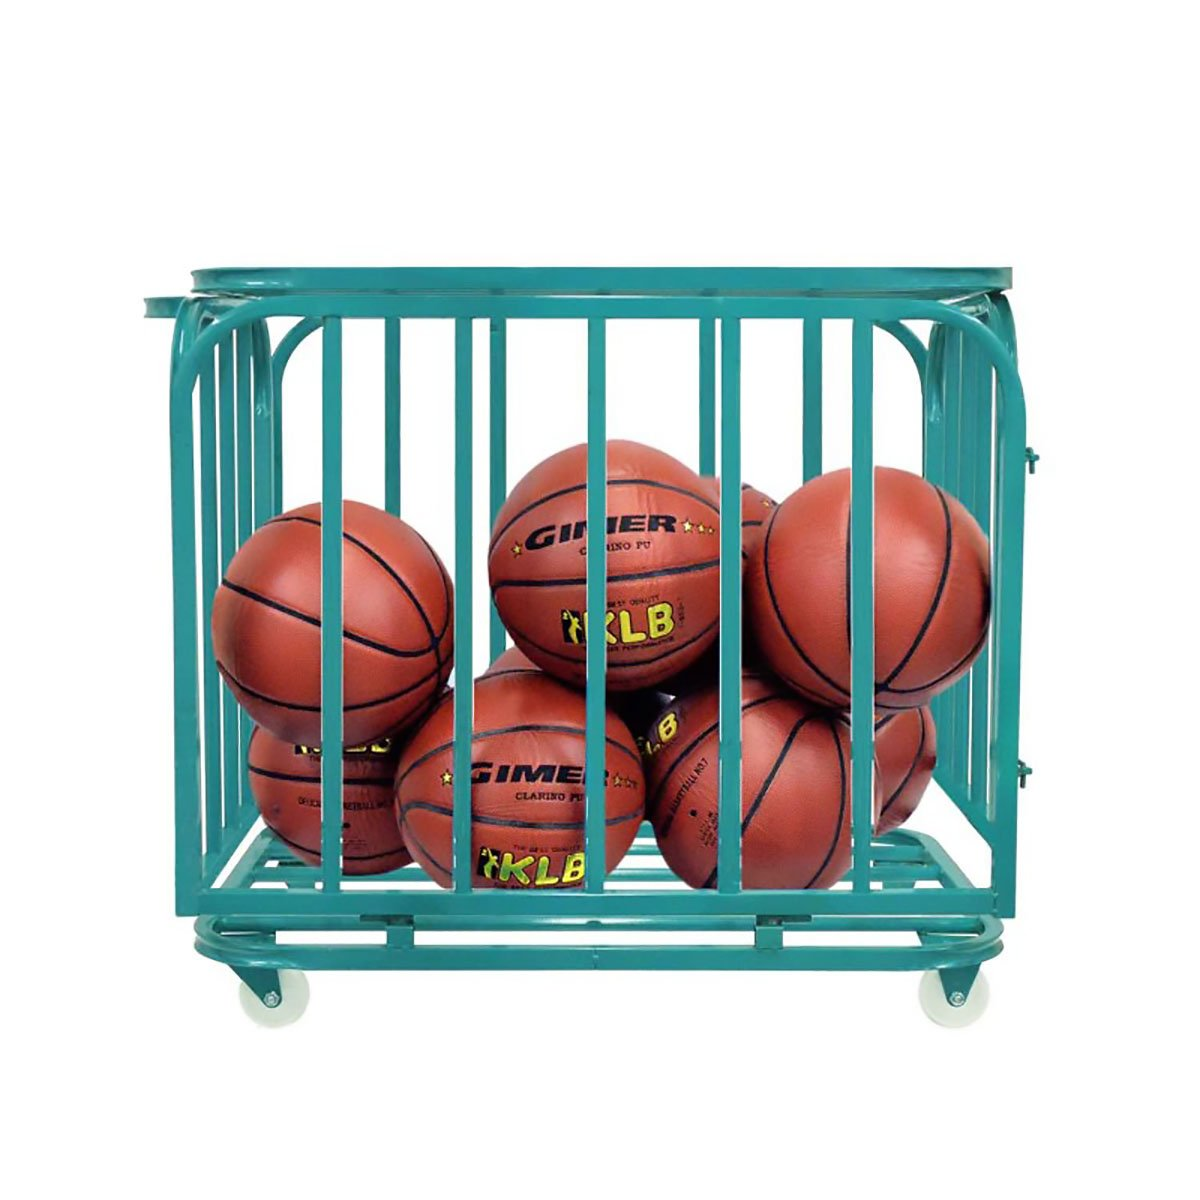 GIMER 10/600 BASKET BASKETBALL PORTAPALLONI 80 x 60 x 70CM BASKETBALL SPORT by Gimer